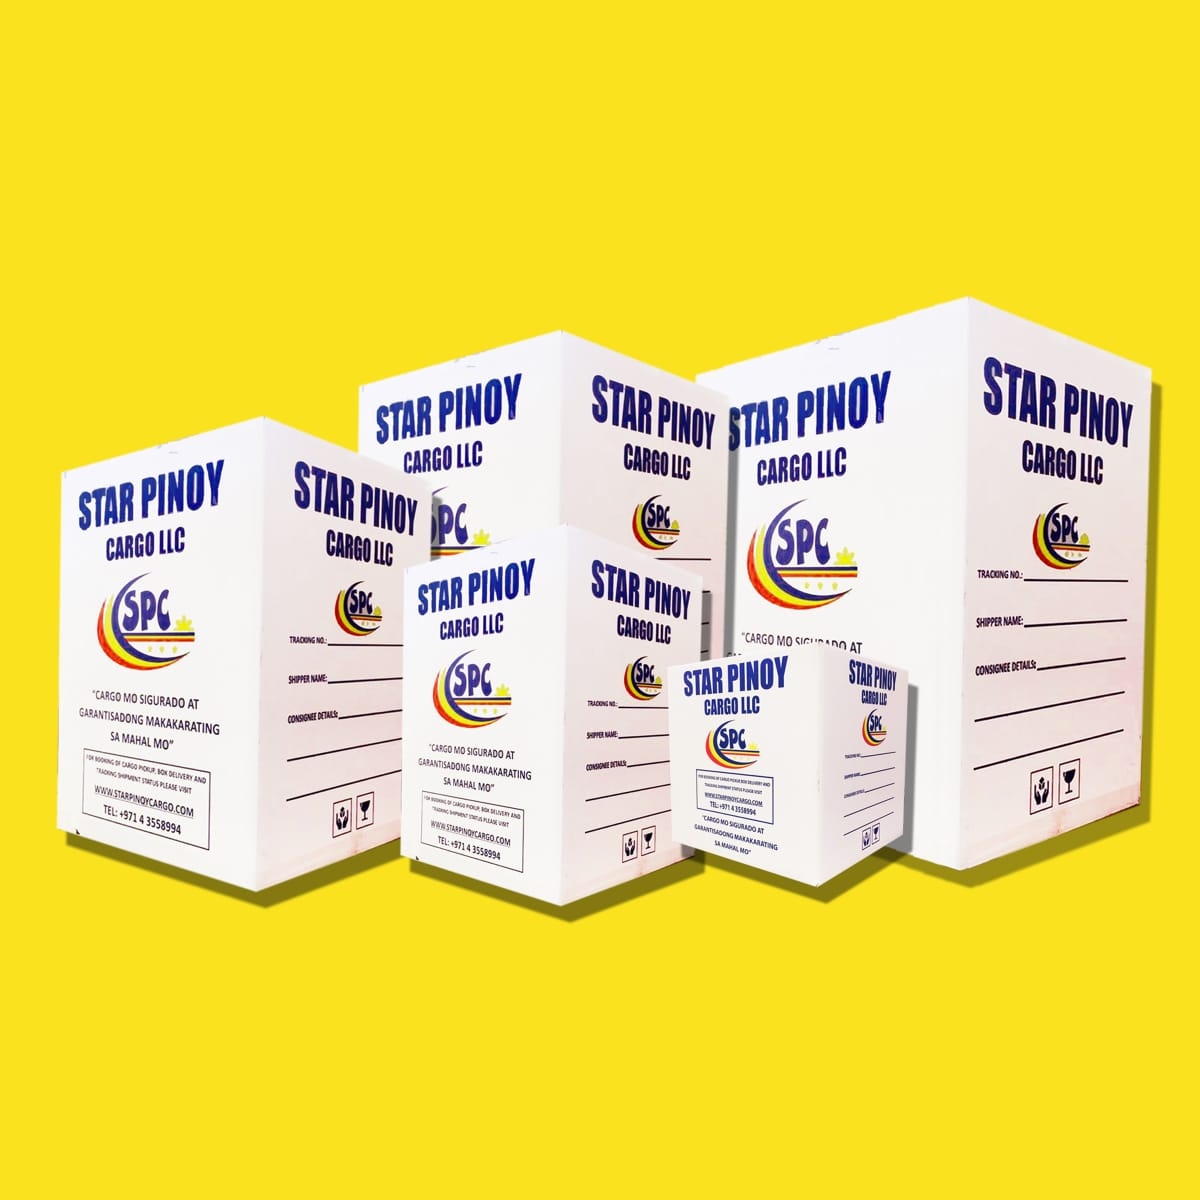 Star Pinoy Cargo Llc